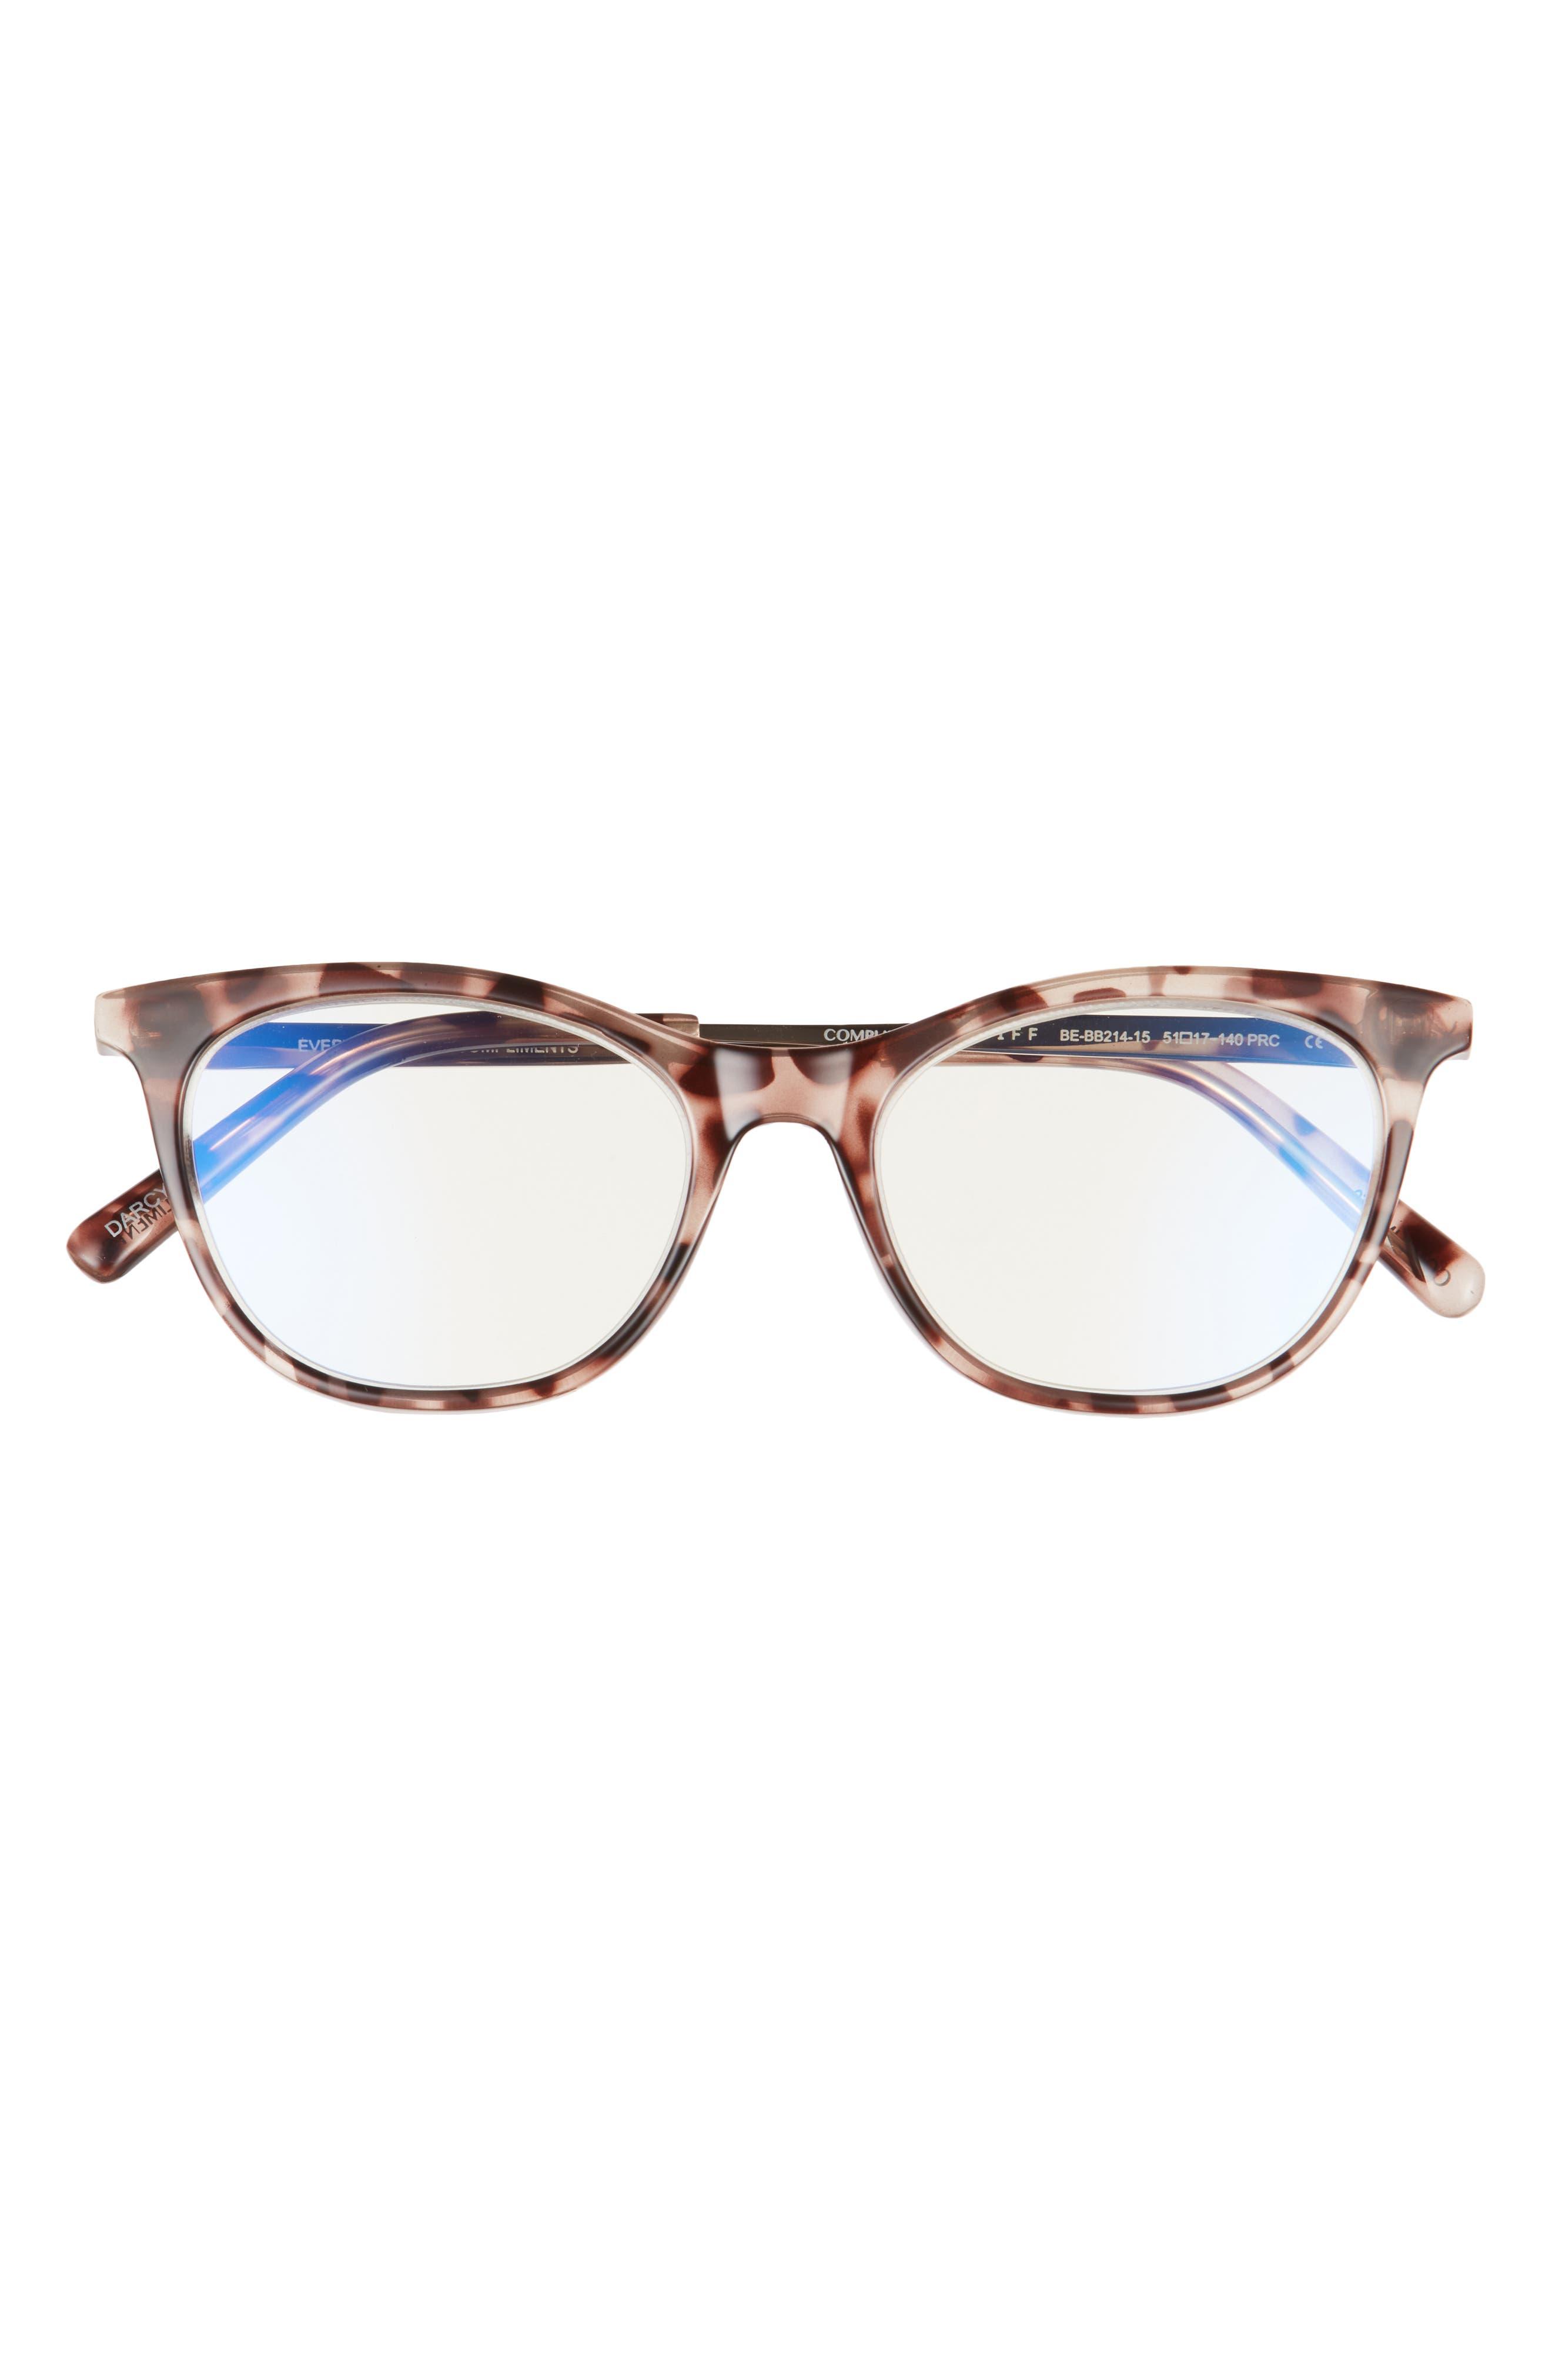 Darcy 51mm Blue Light Blocking Reading Glasses